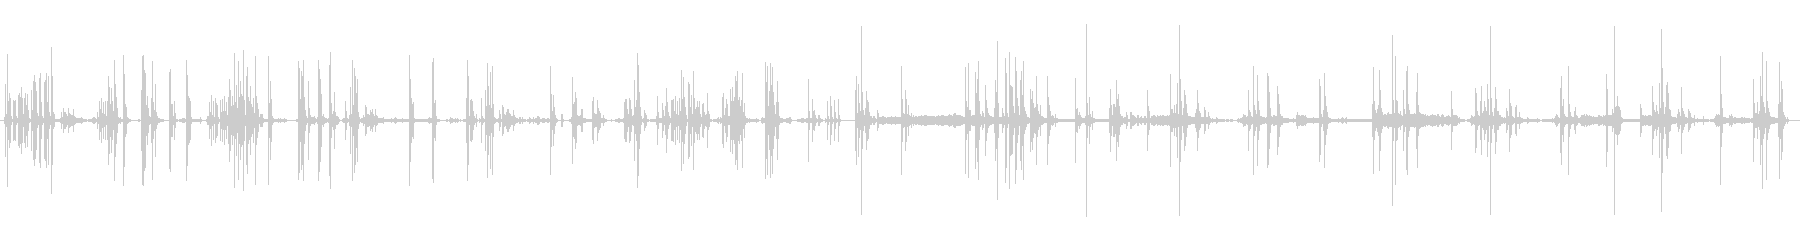 MACHINE、FLIPPER、F...の未再生の波形